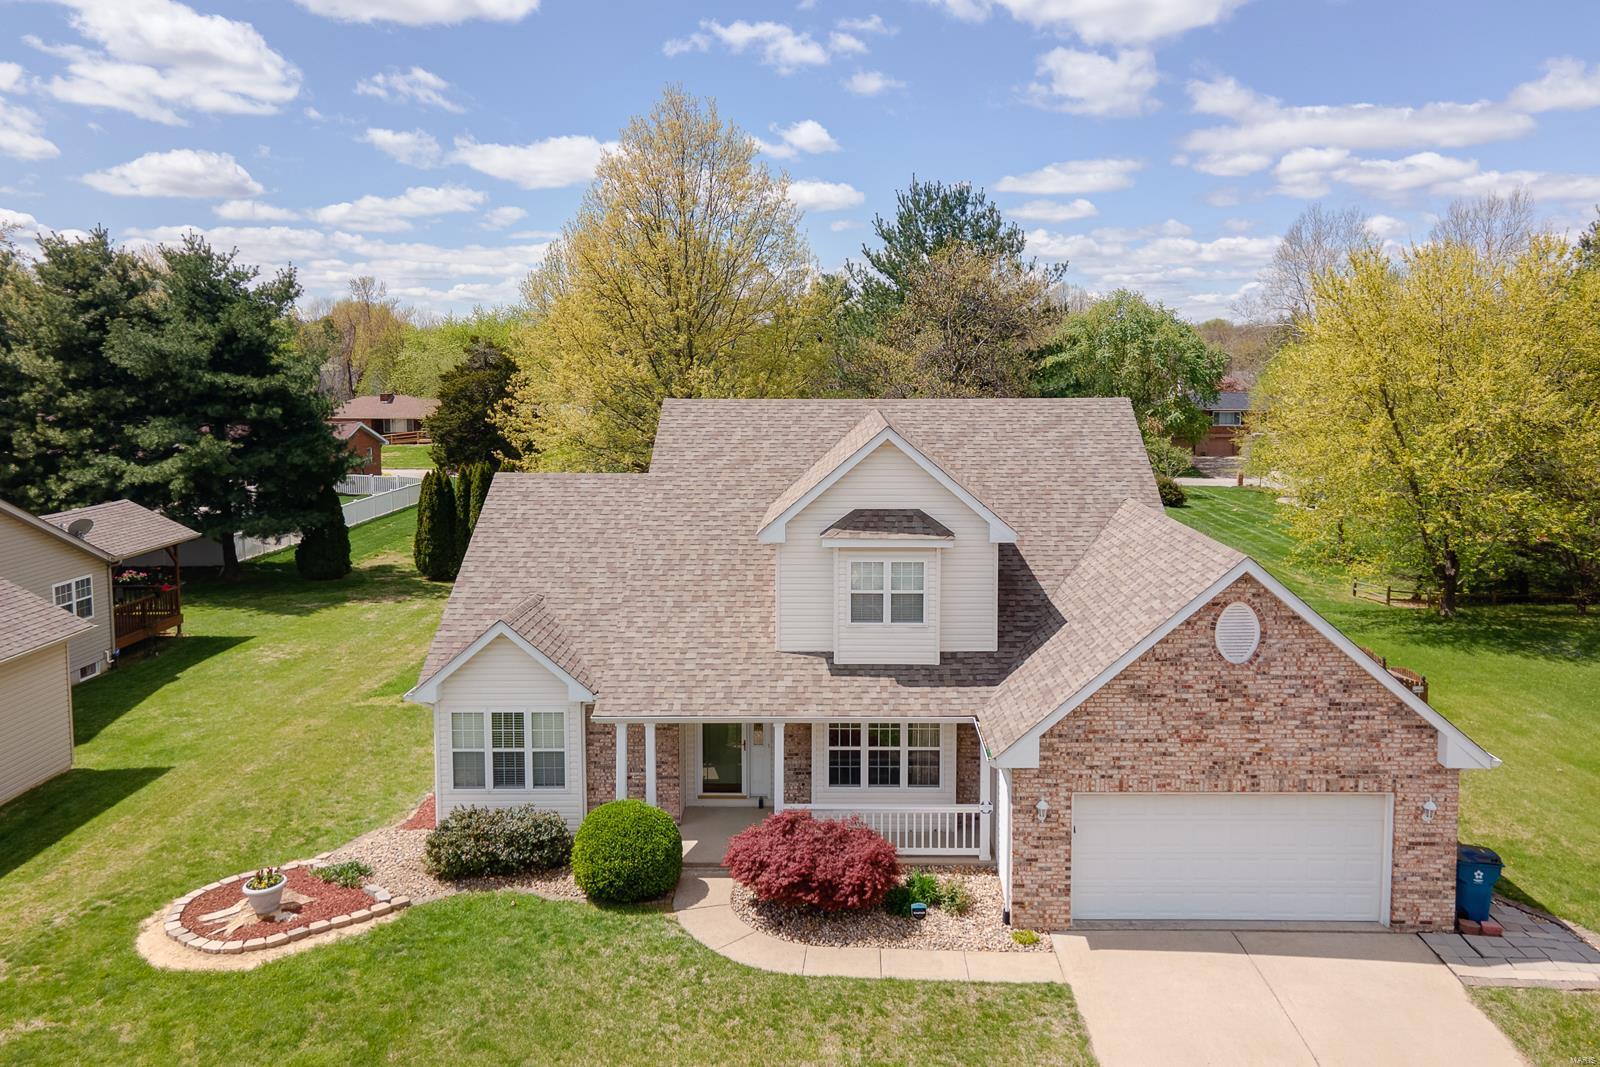 137 Sundown Property Photo - Maryville, IL real estate listing